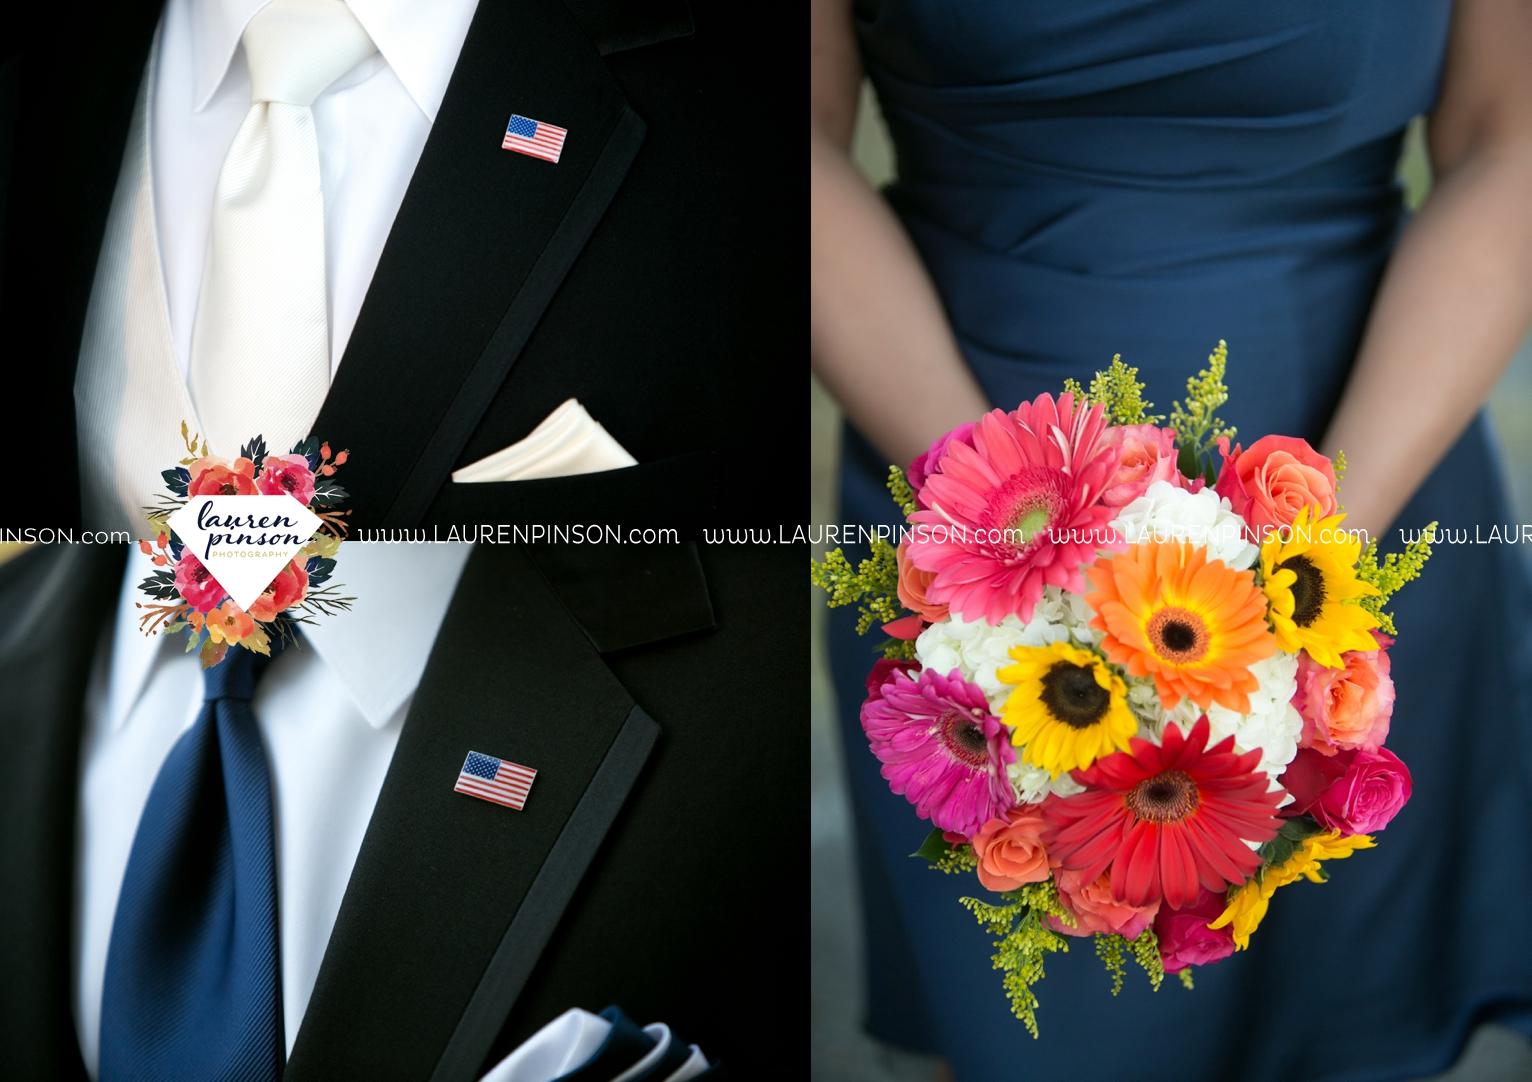 bells-texas-wedding-photography-at-willowood-ranch-chapel-north-texas-wichita-falls-wedding-photographer_1838.jpg